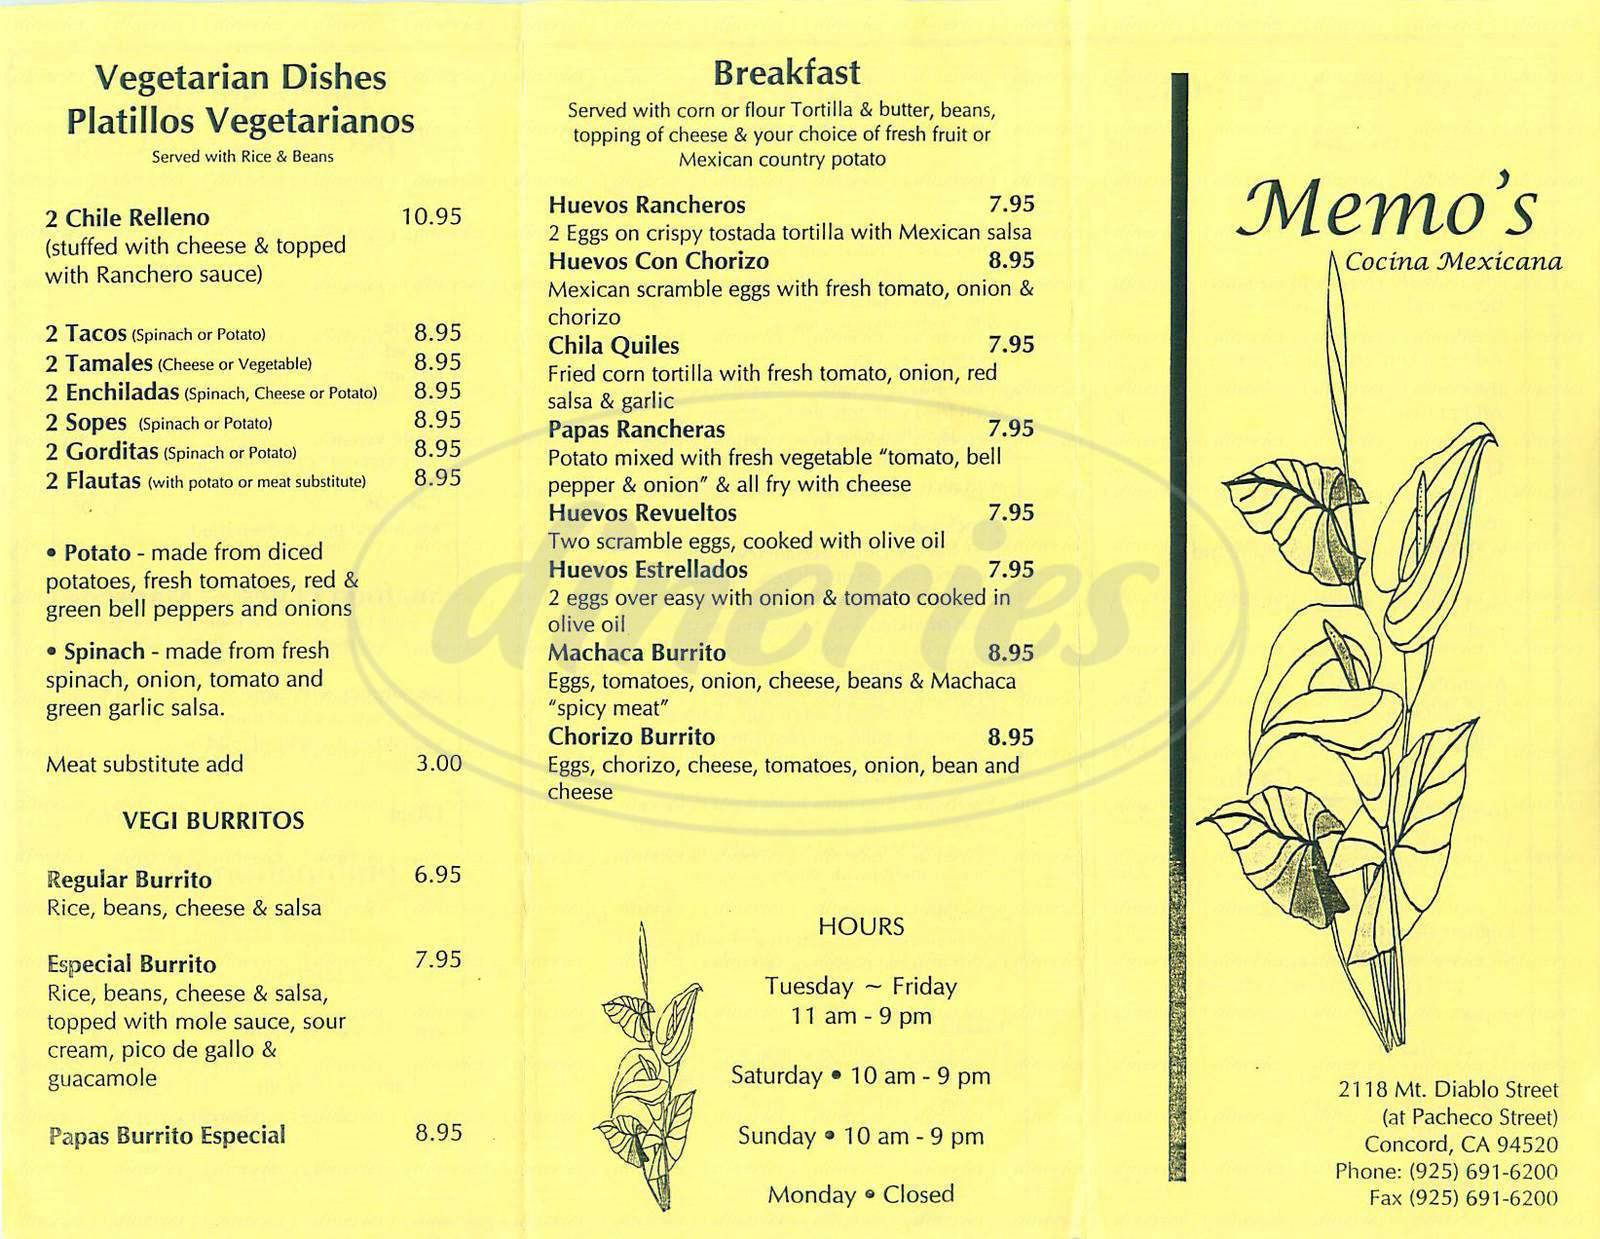 menu for Memos Cocina Mexicana